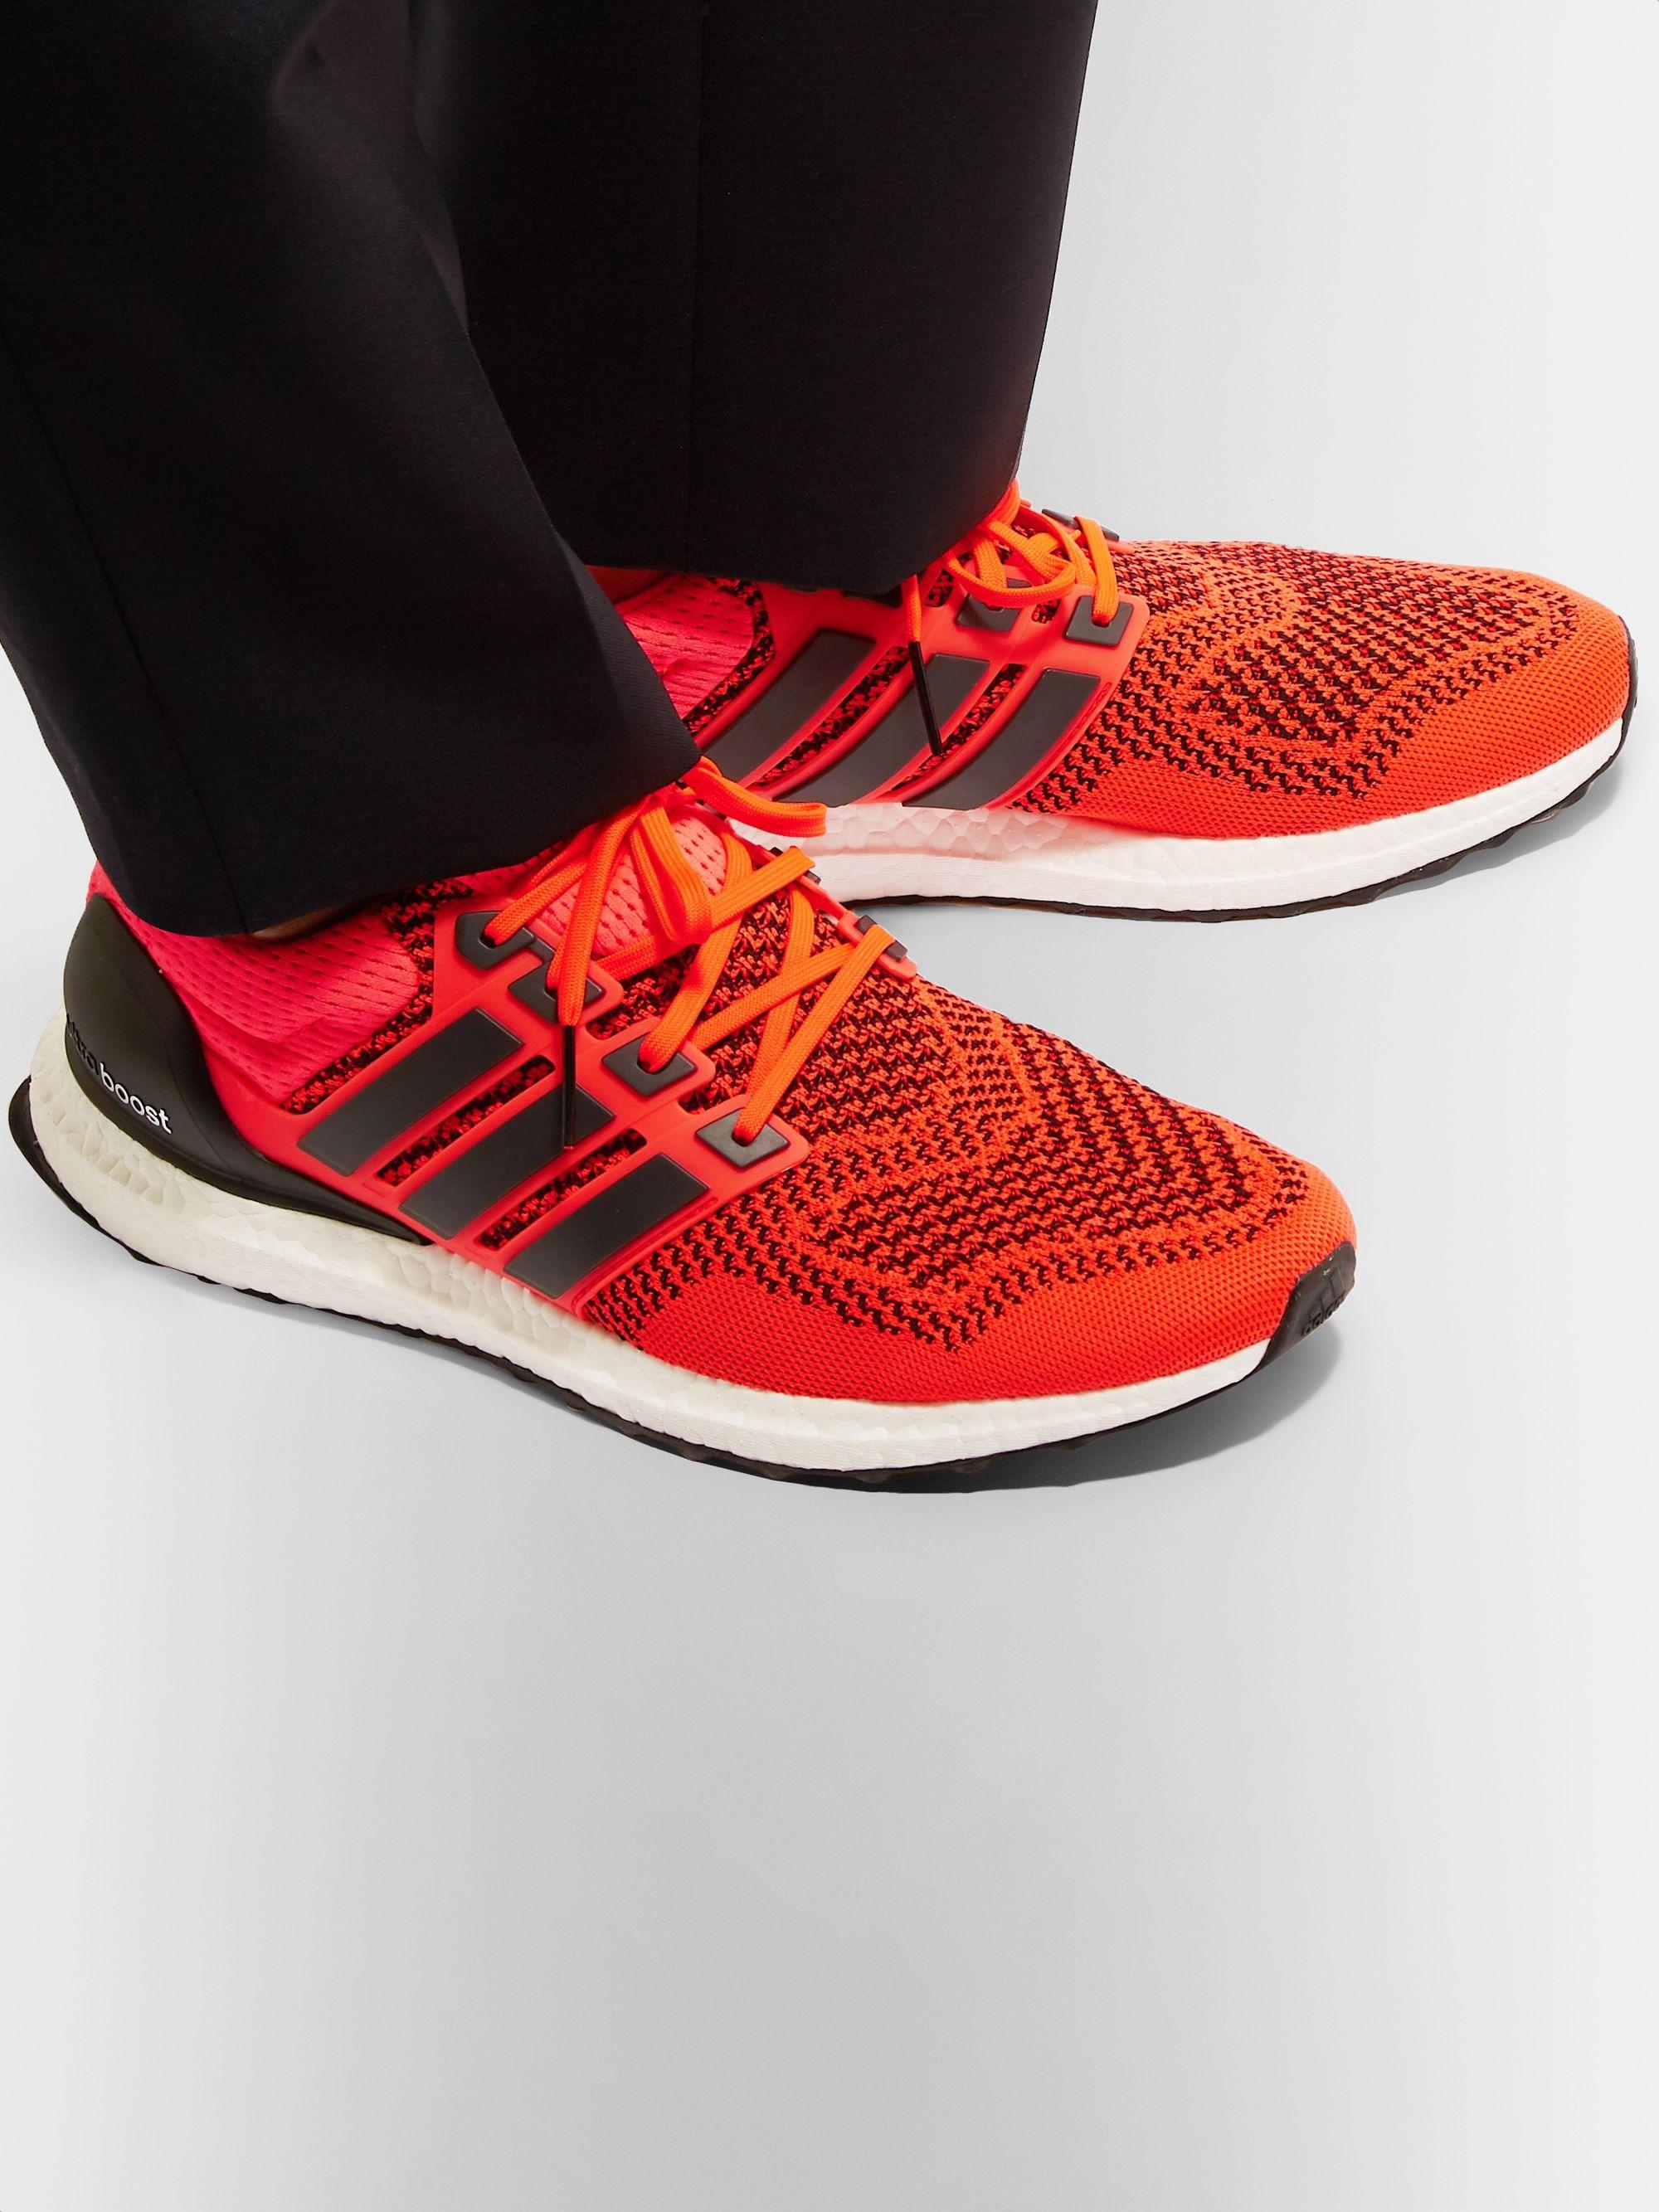 UltraBOOST 1.0 Rubber-Trimmed Primeknit Running Sneakers